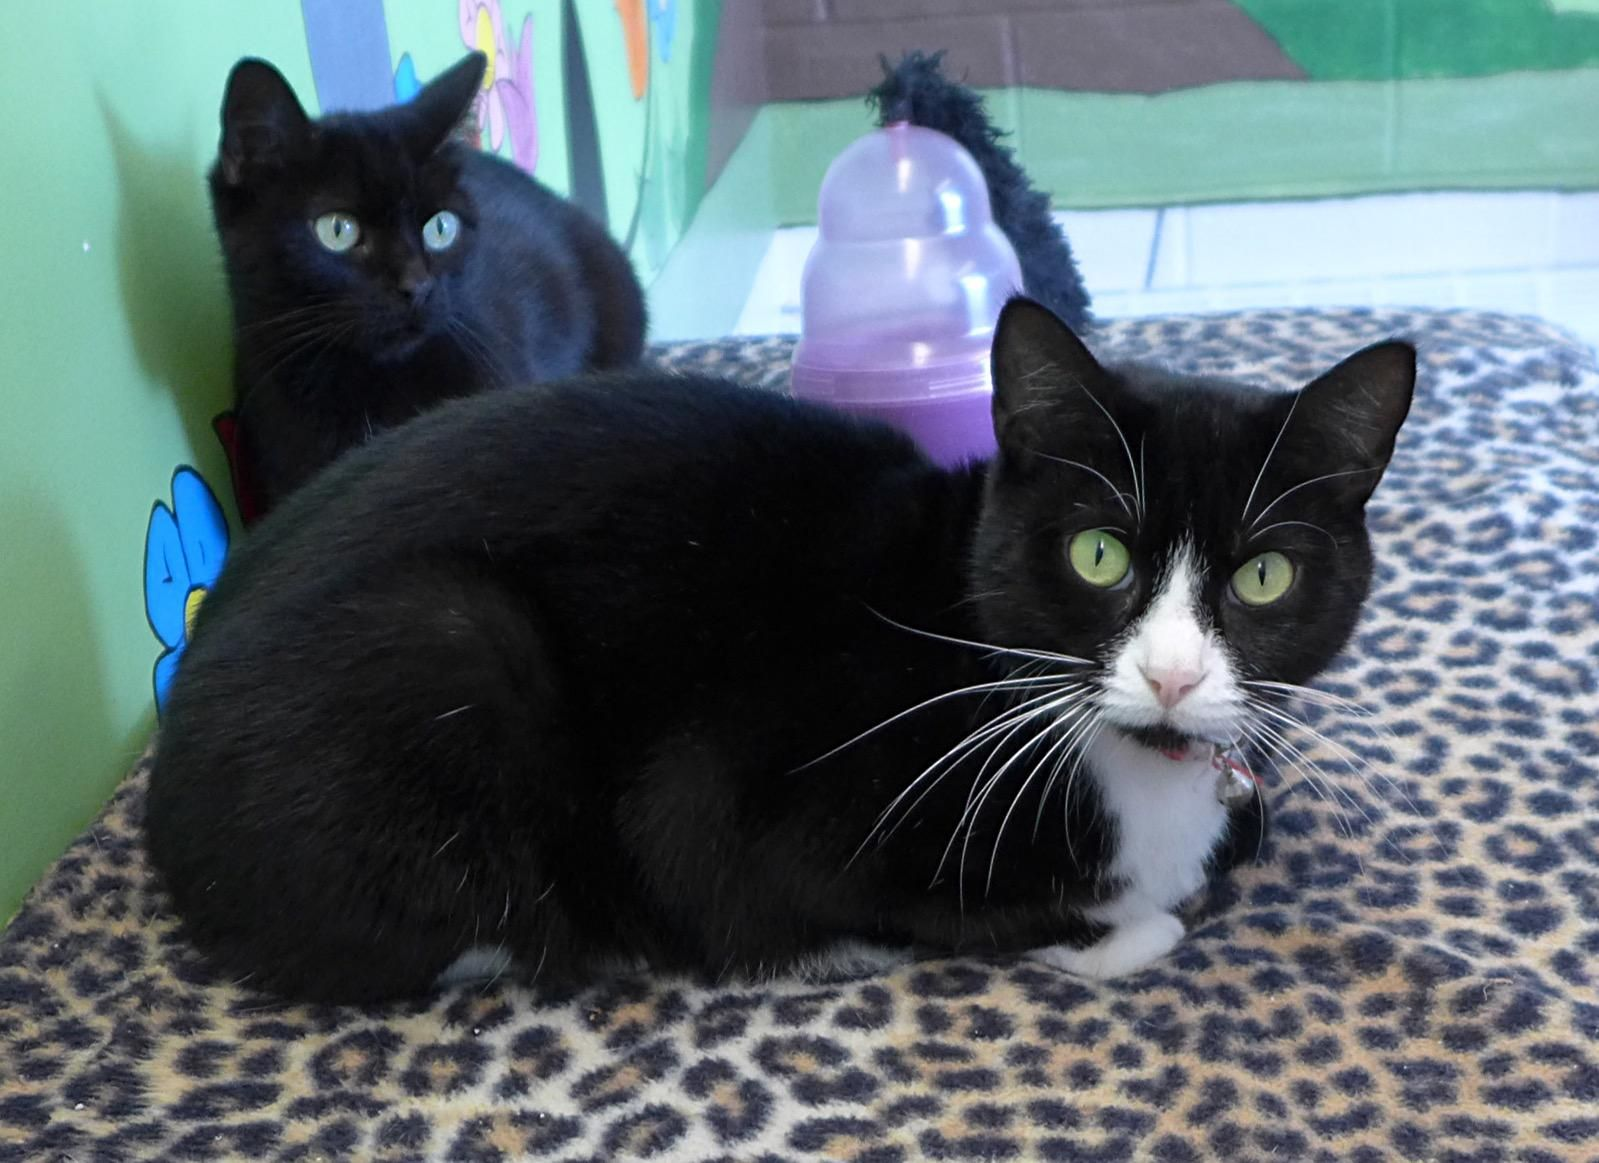 I Found Soxy 32258343 On Kitten Adoption Cat Adoption Cats